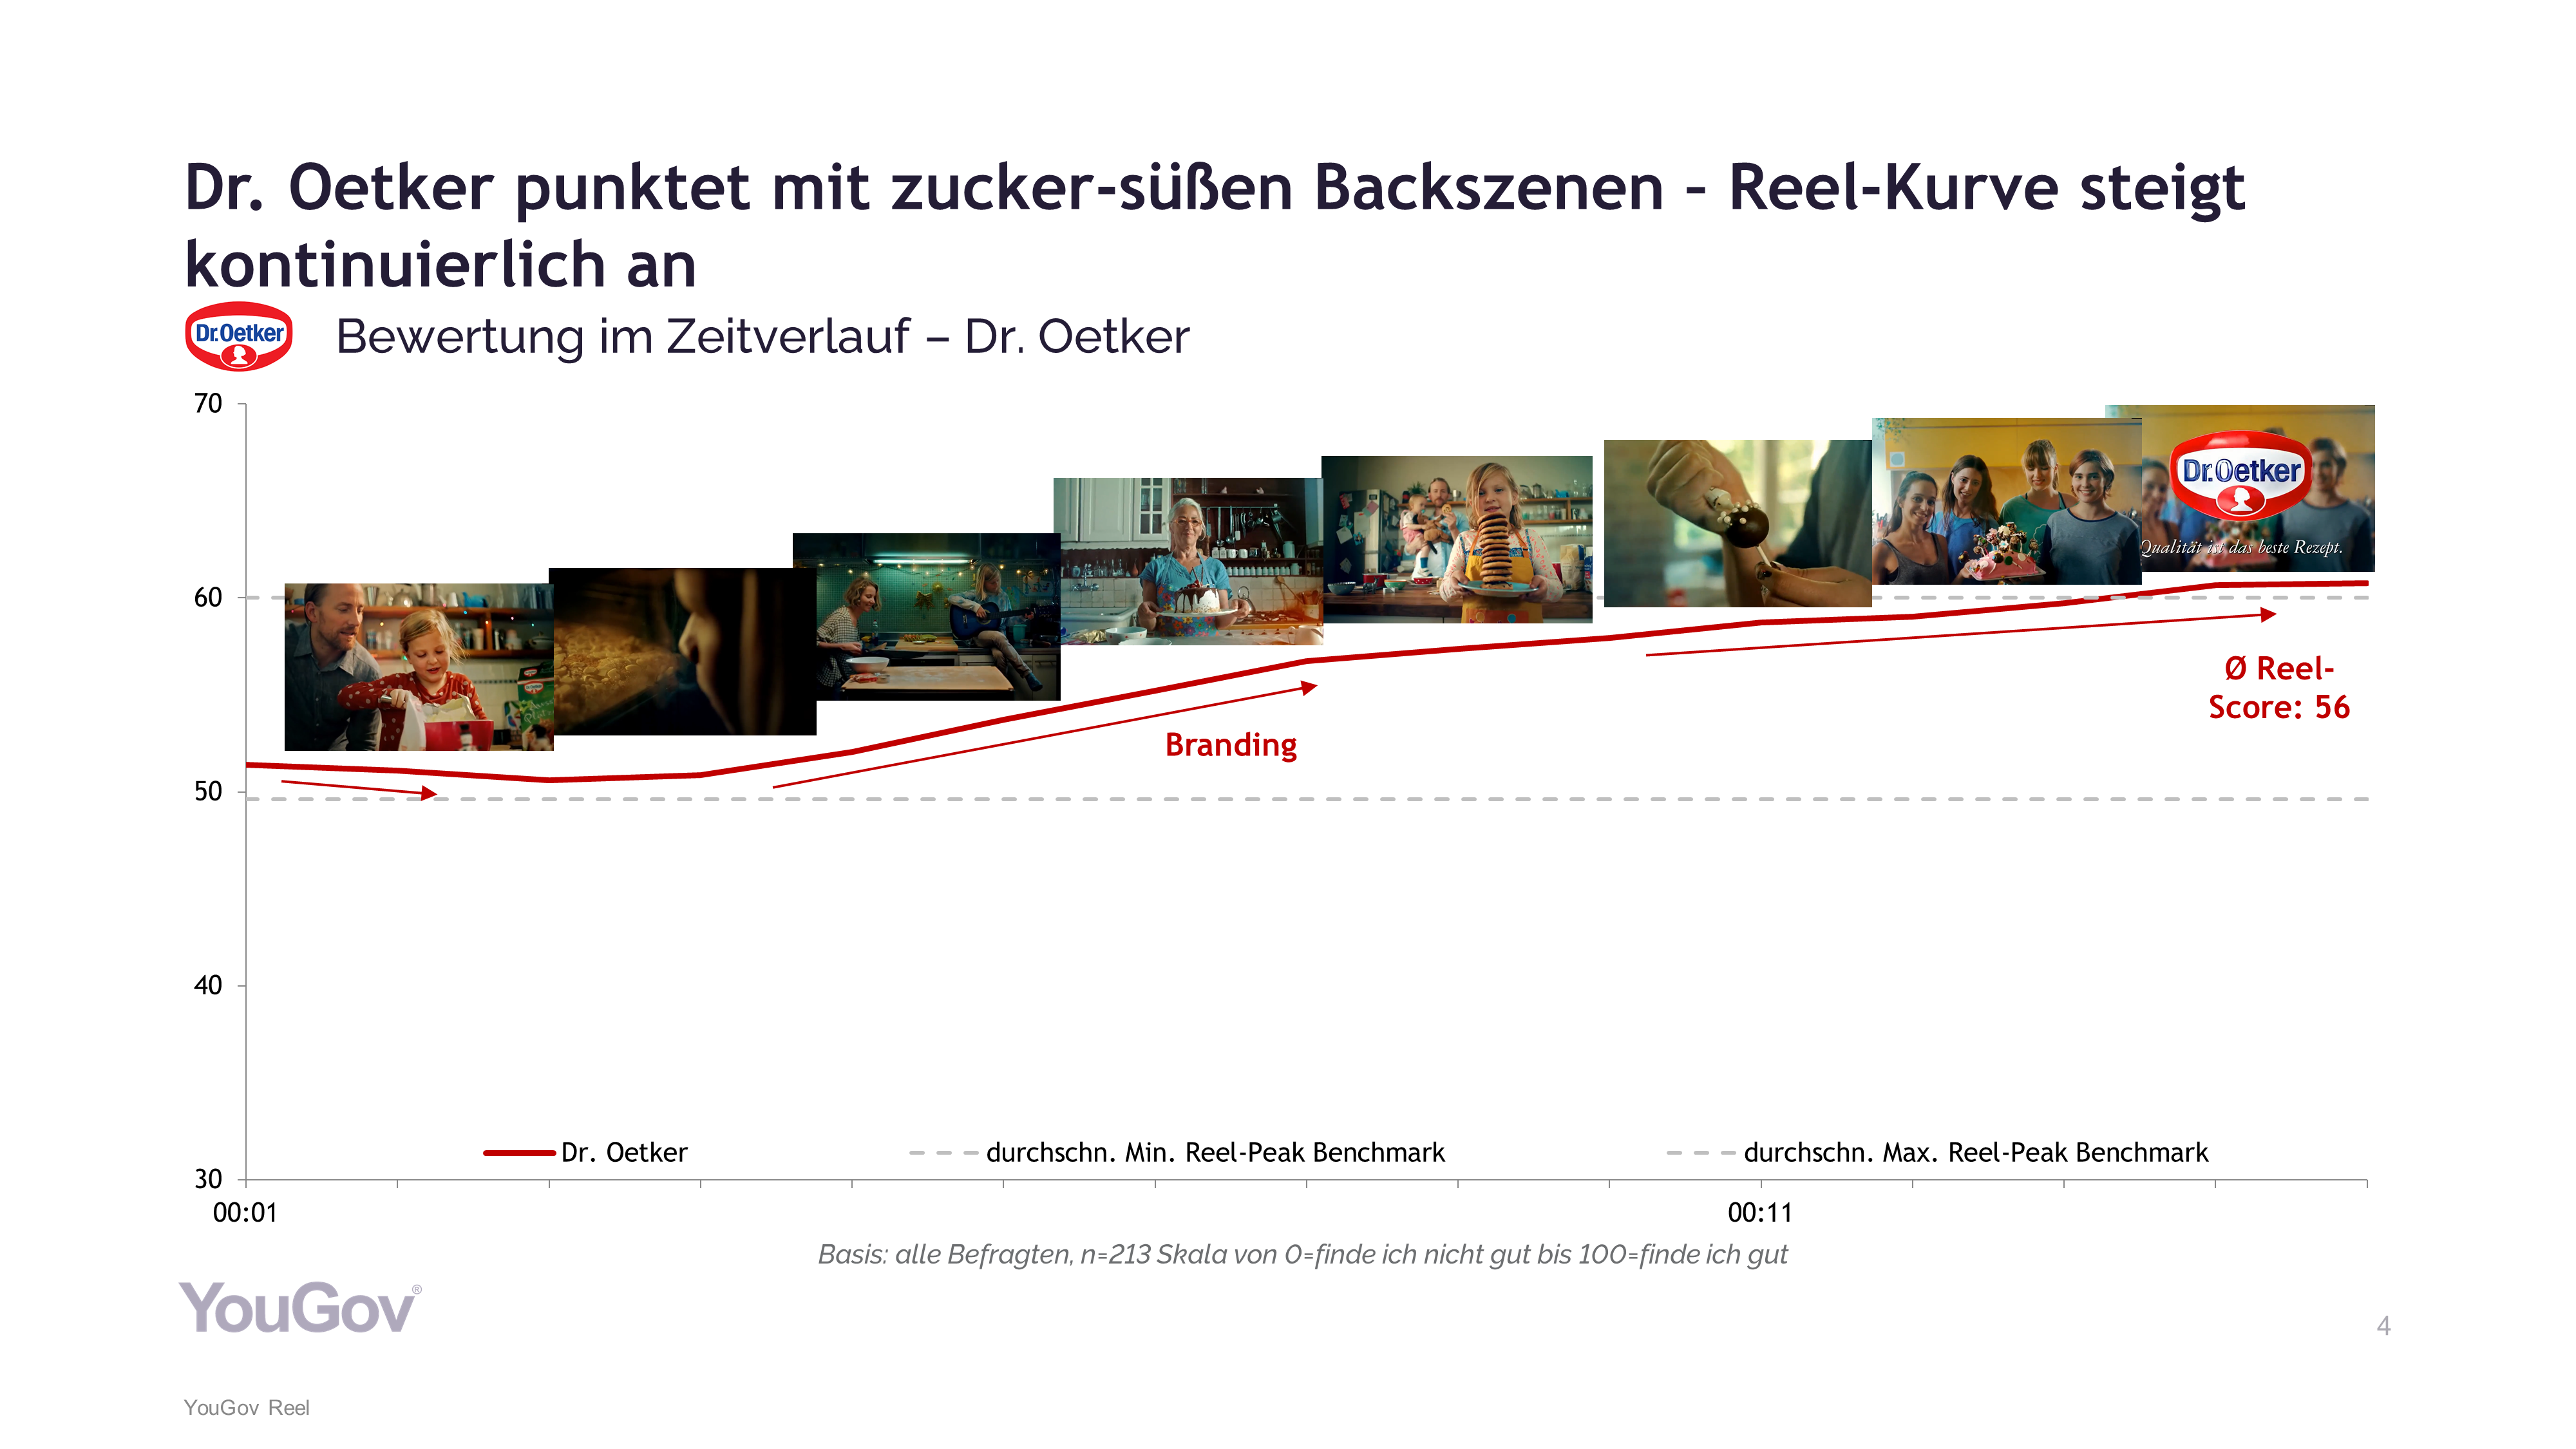 Dr. Oetker Werbespot